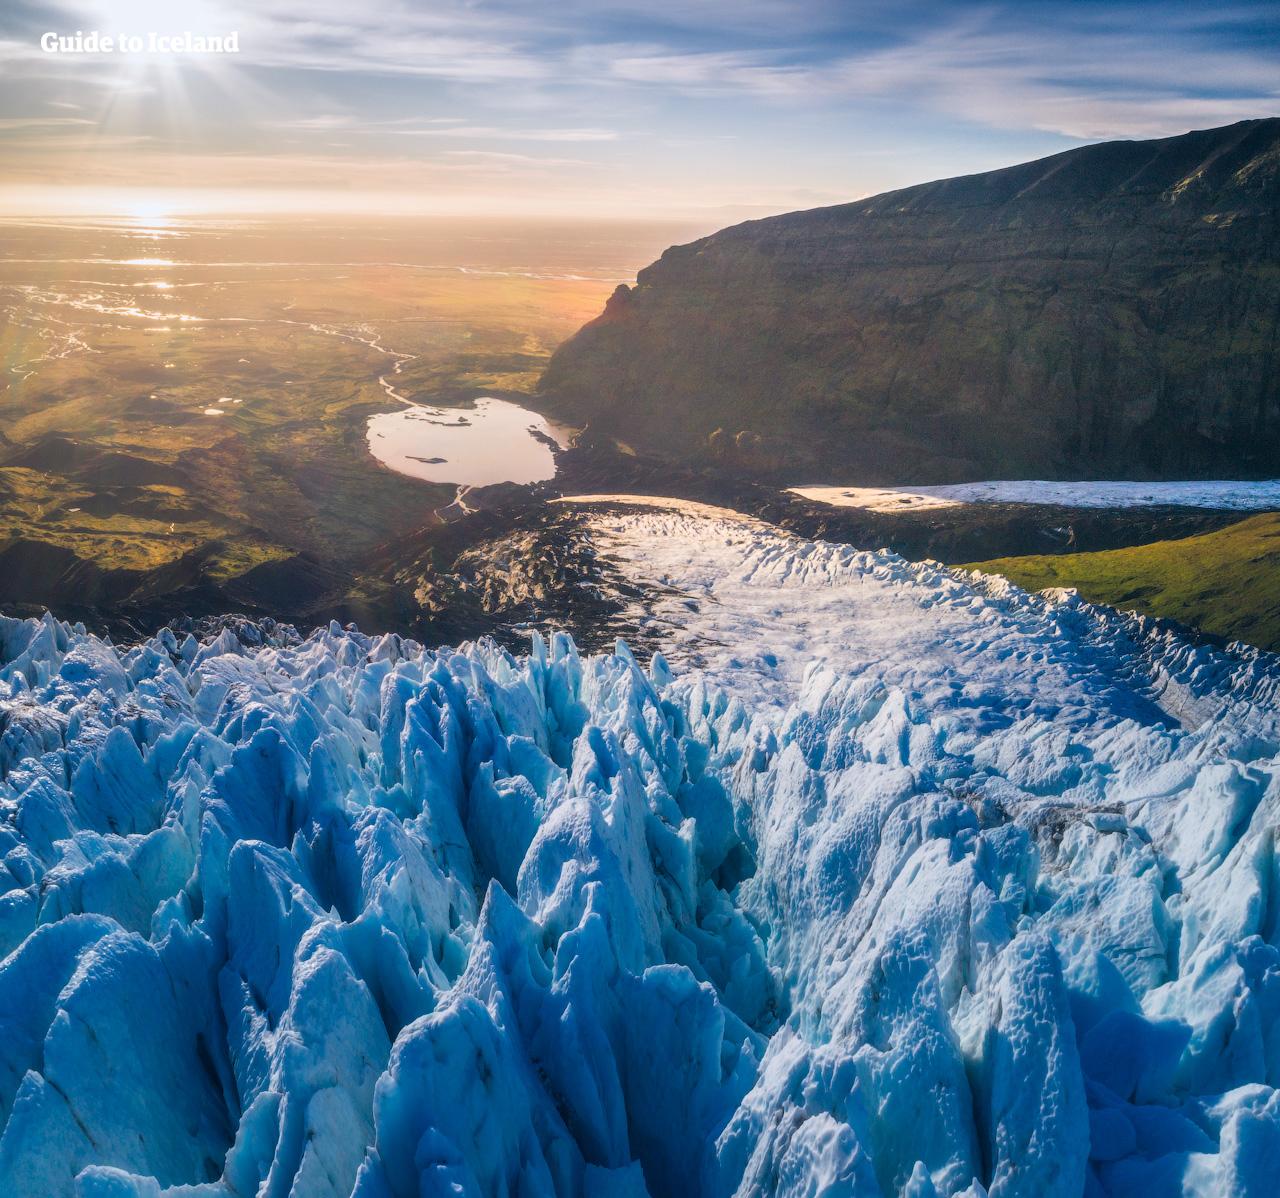 Vatnajokull couvre 8% de la masse continentale de l'Islande.